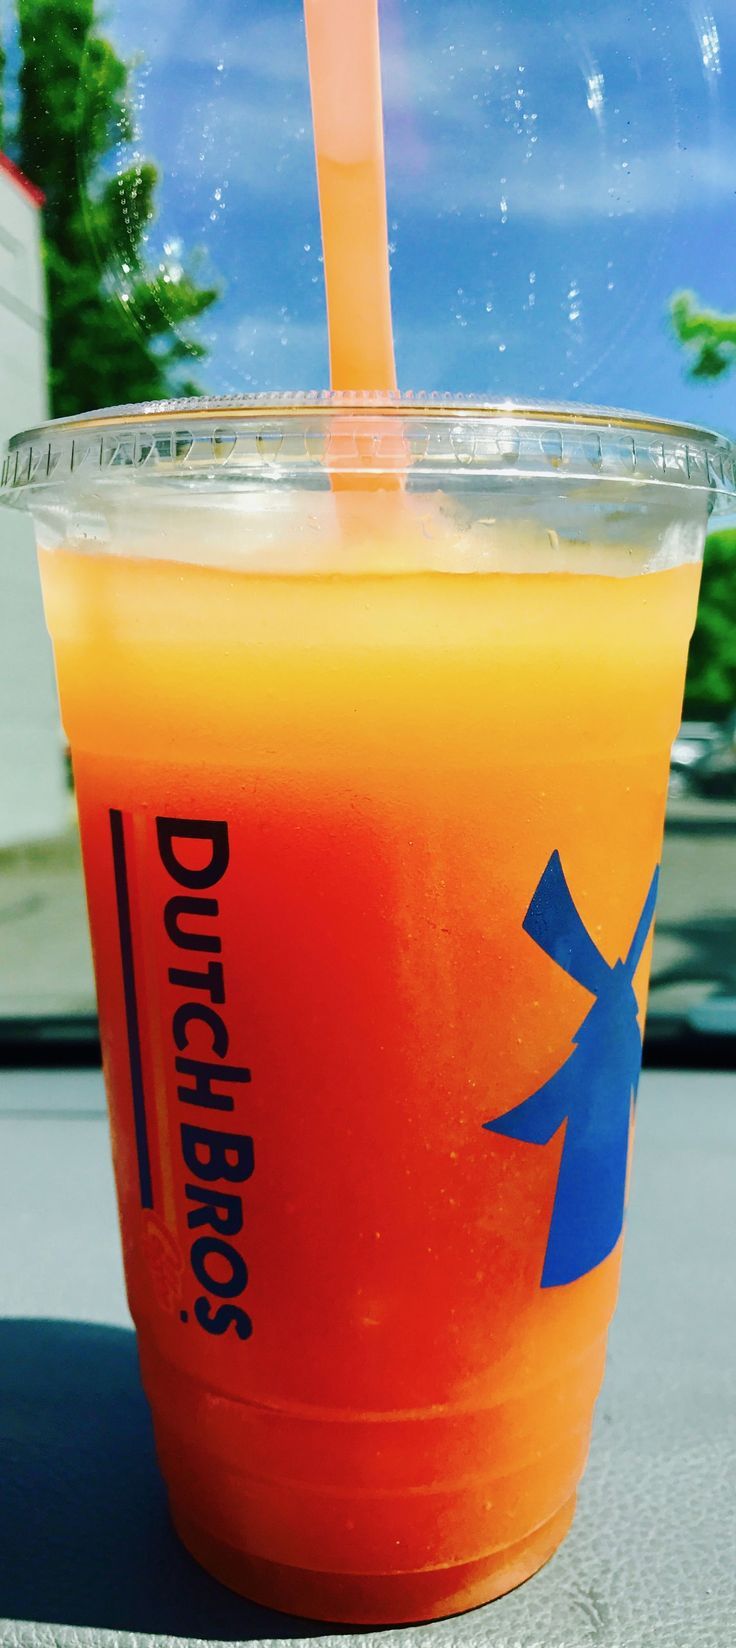 Dutch bros dutchbros dutch bros drinks dutch bros